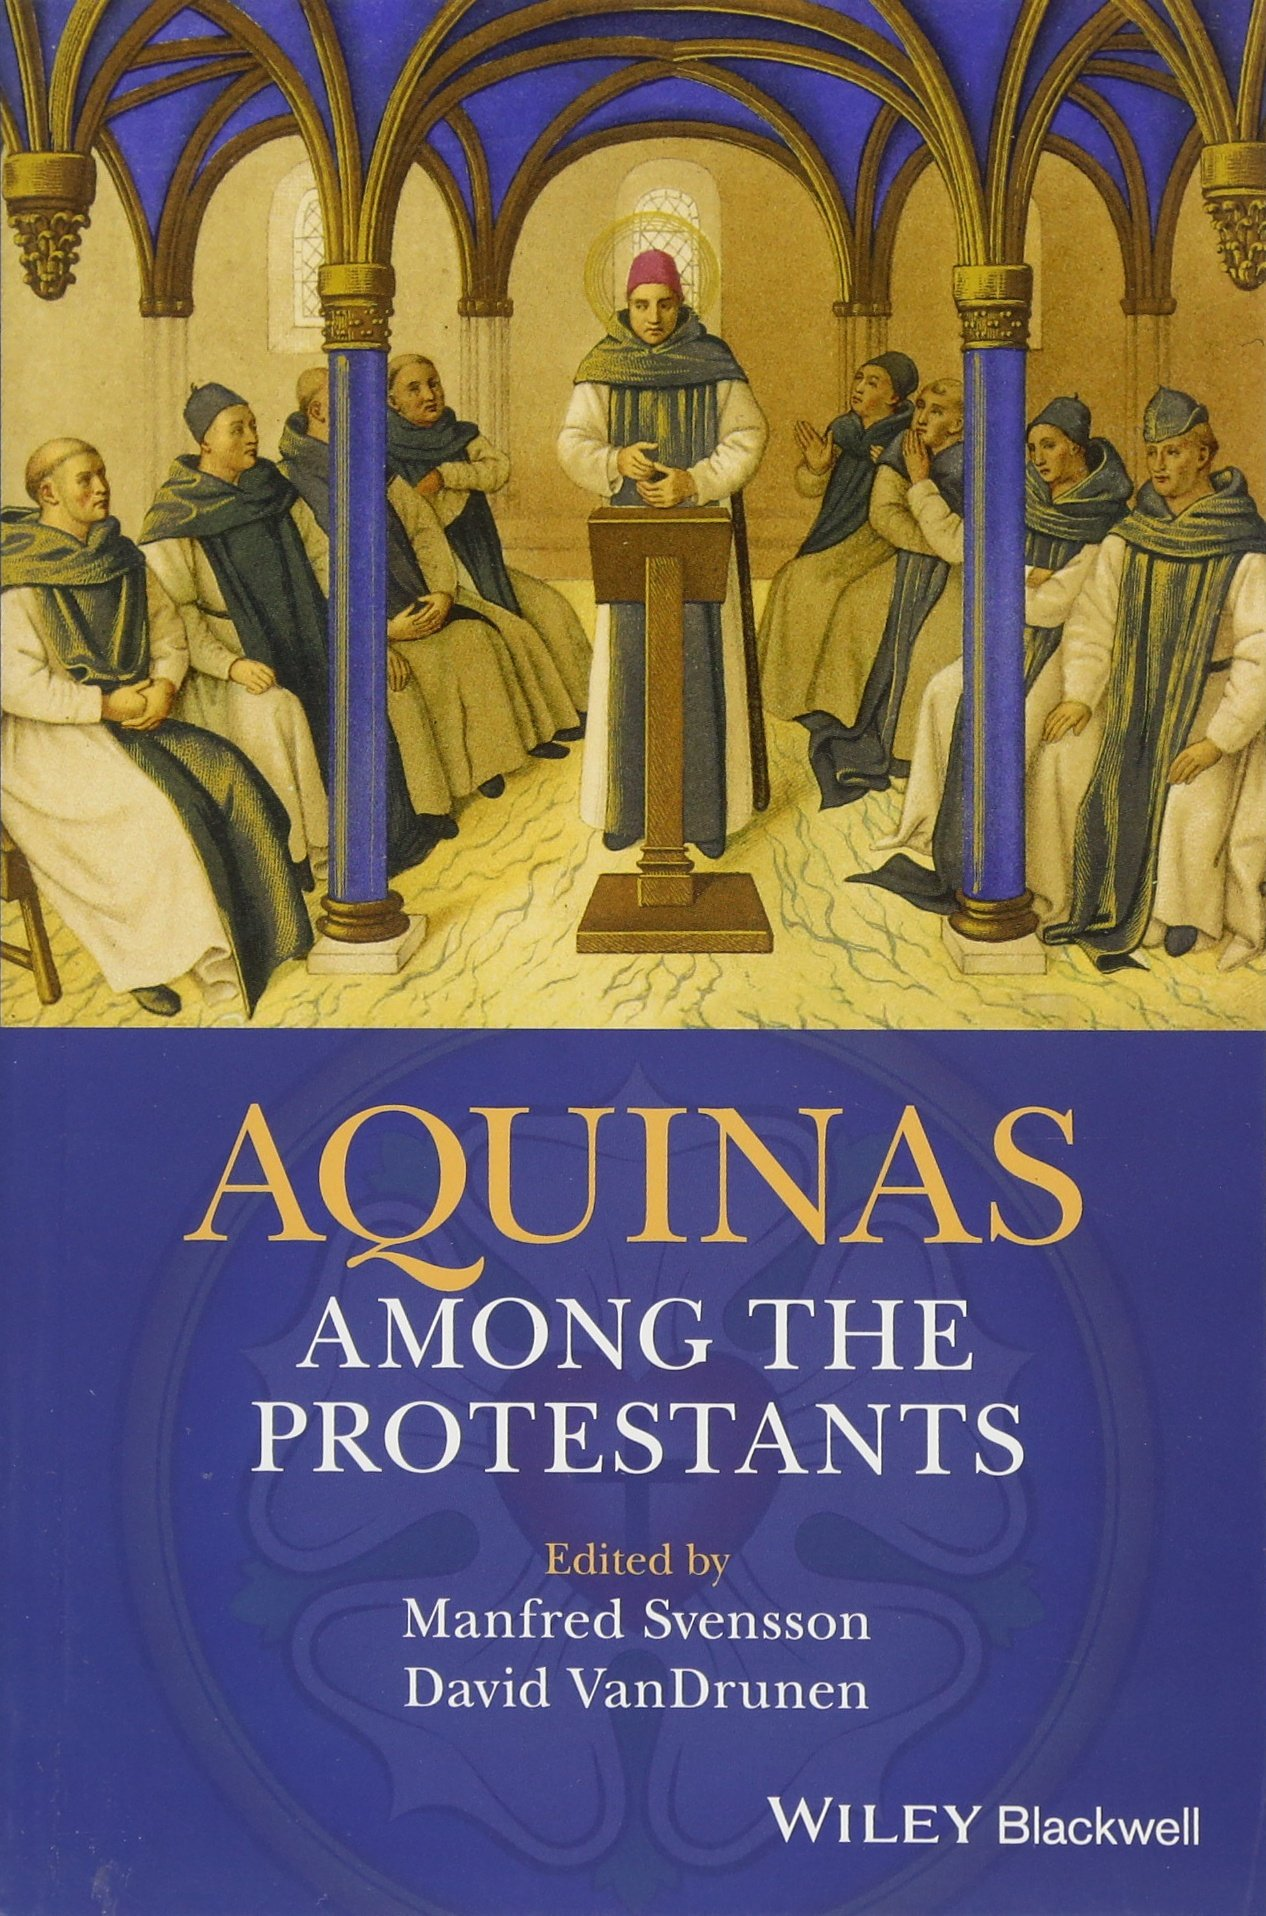 Aquinas Among the Protestants (Inglese) Copertina flessibile – 29 set 2017 Manfred Svensson David Vandrunen Blackwell Pub 1119265940